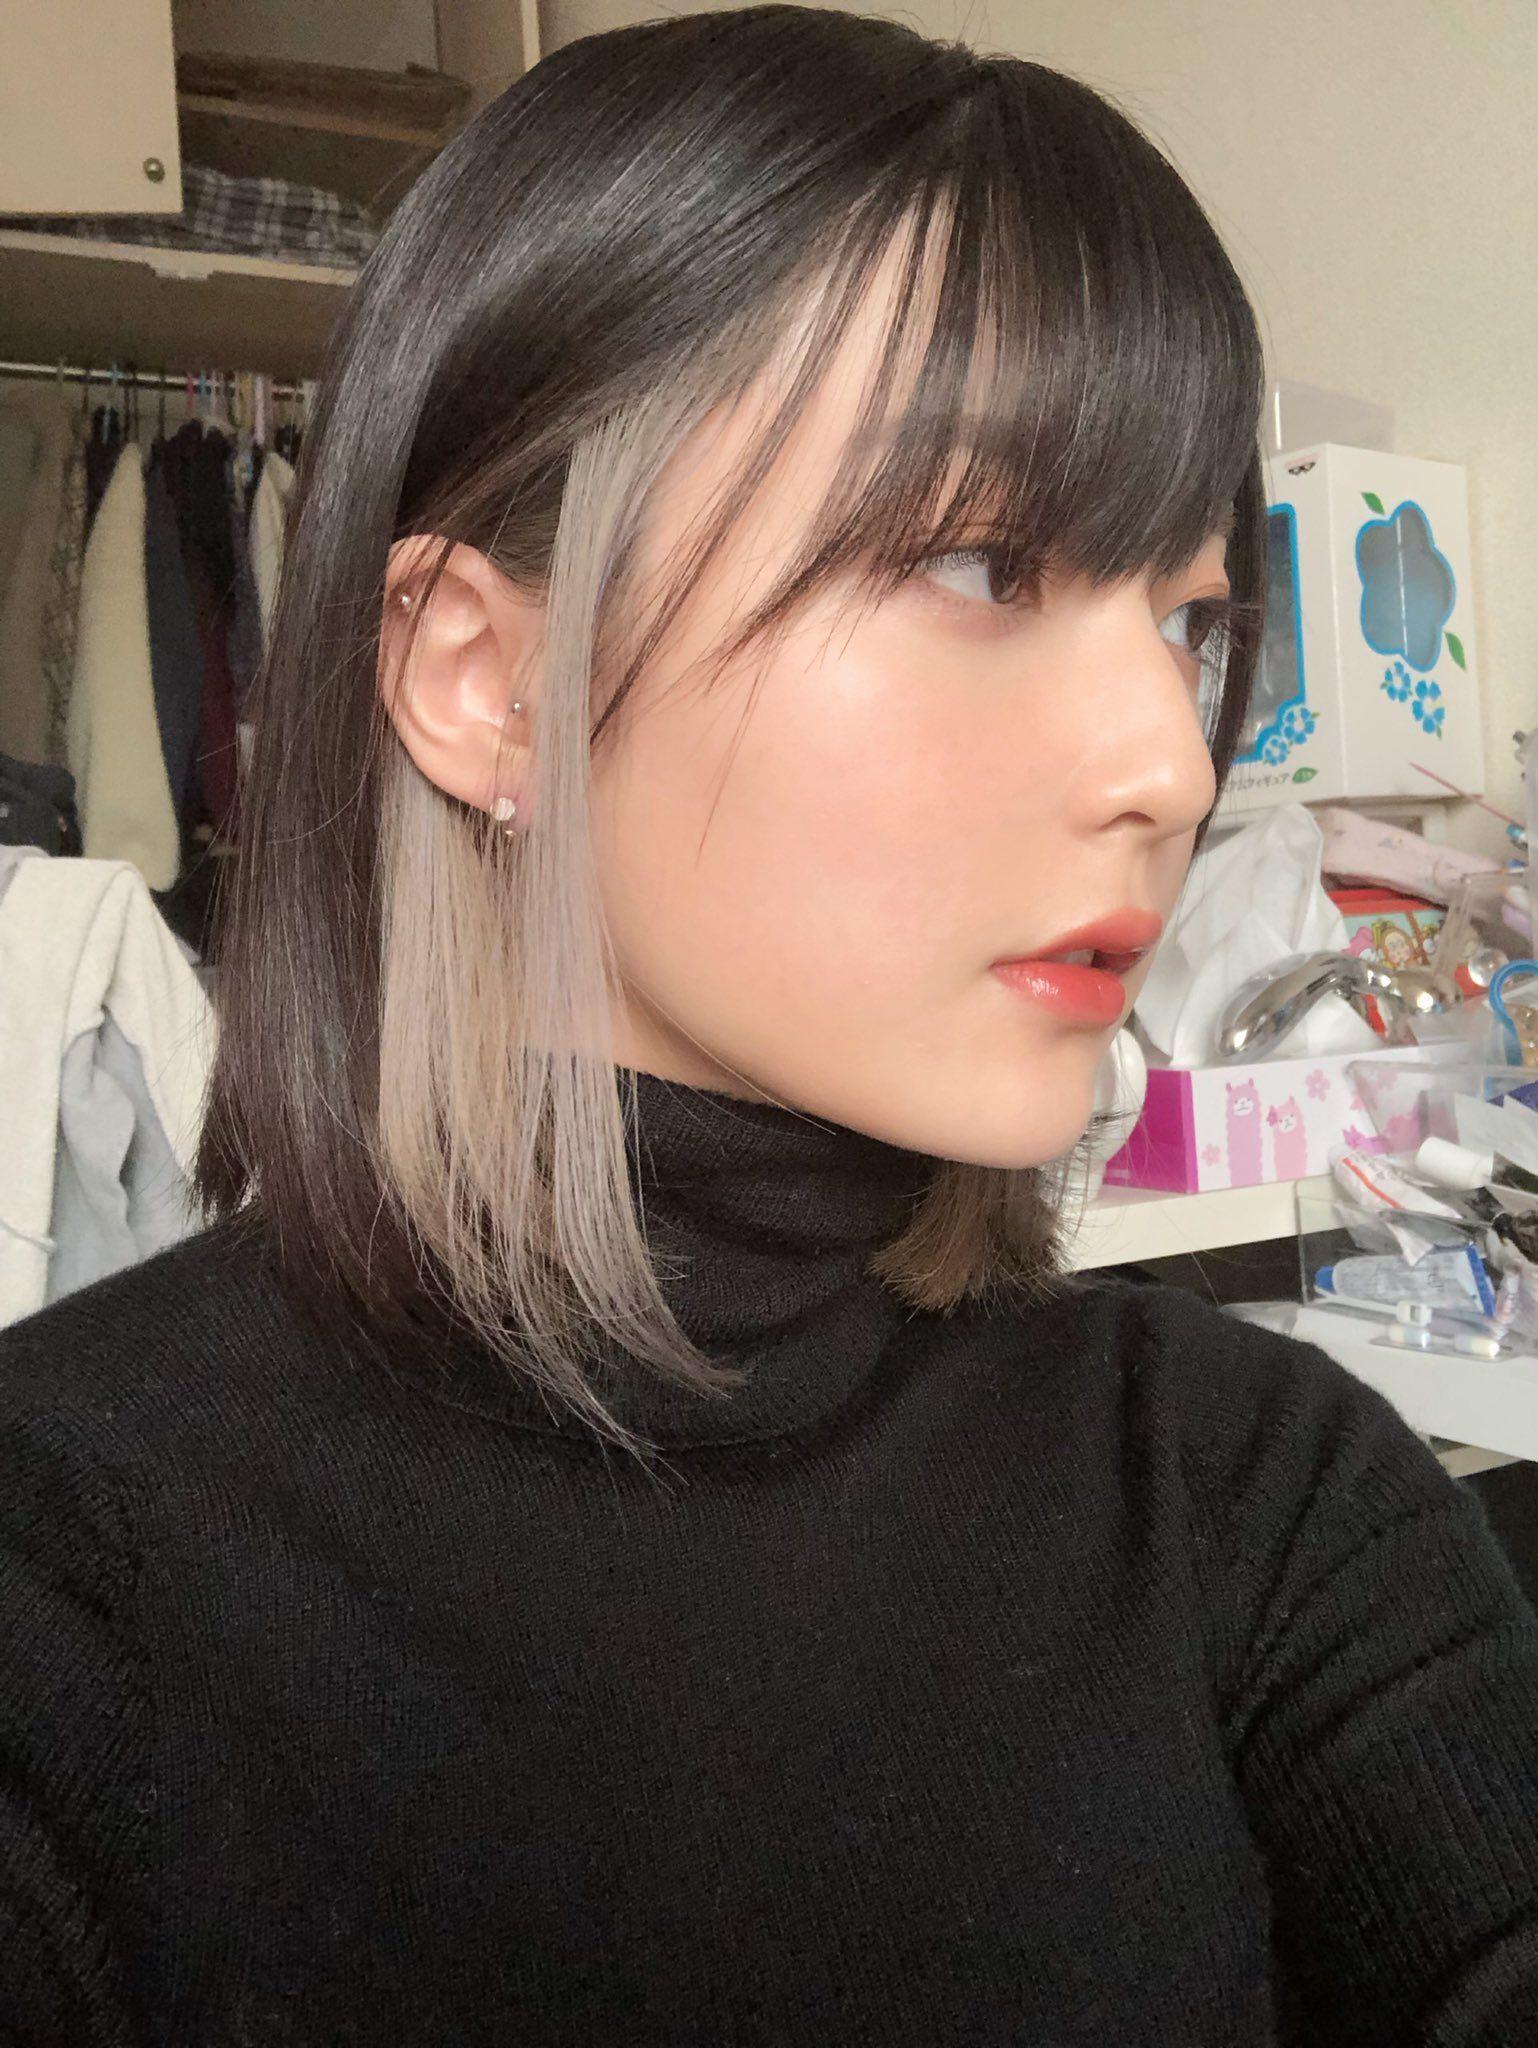 佳乃 on Twitter